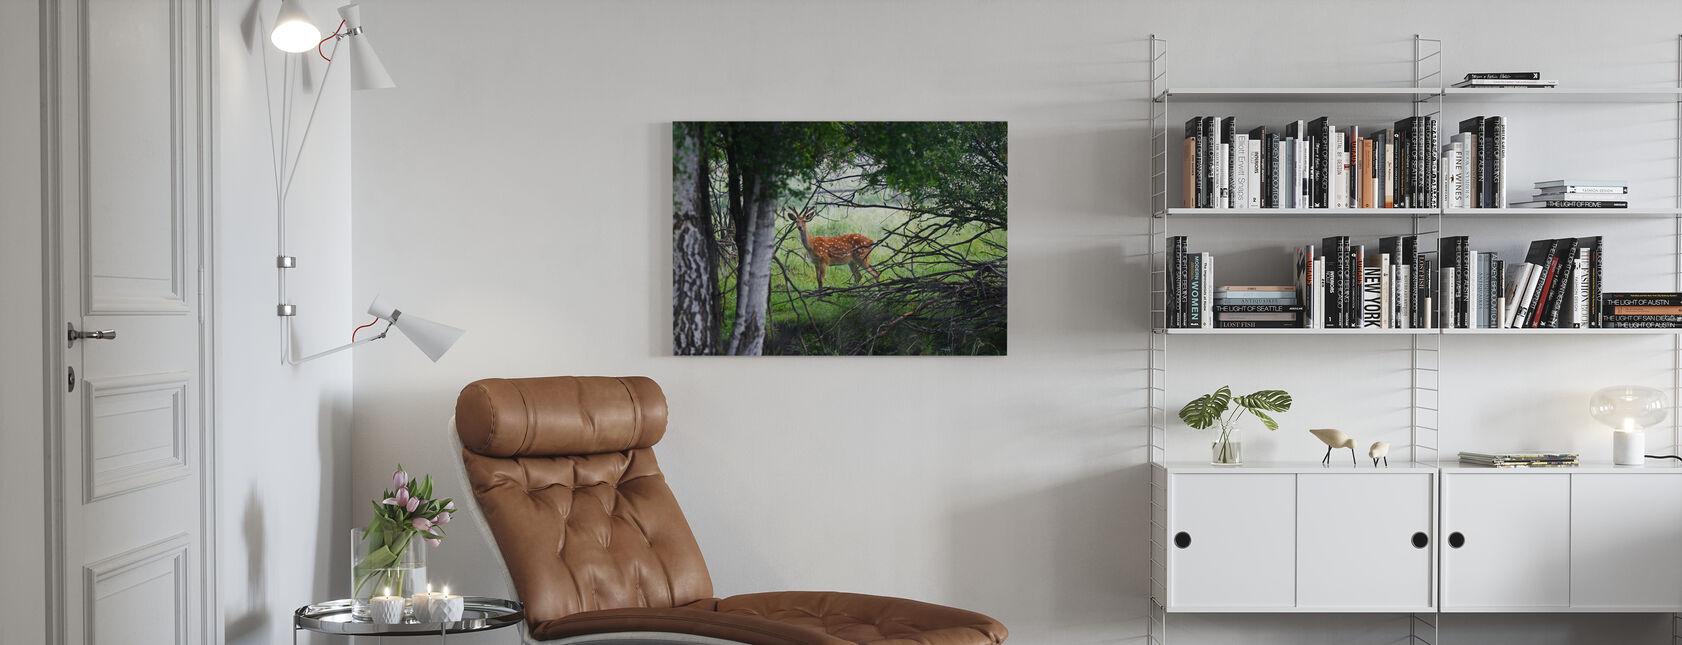 Cervo selvatico - Stampa su tela - Salotto